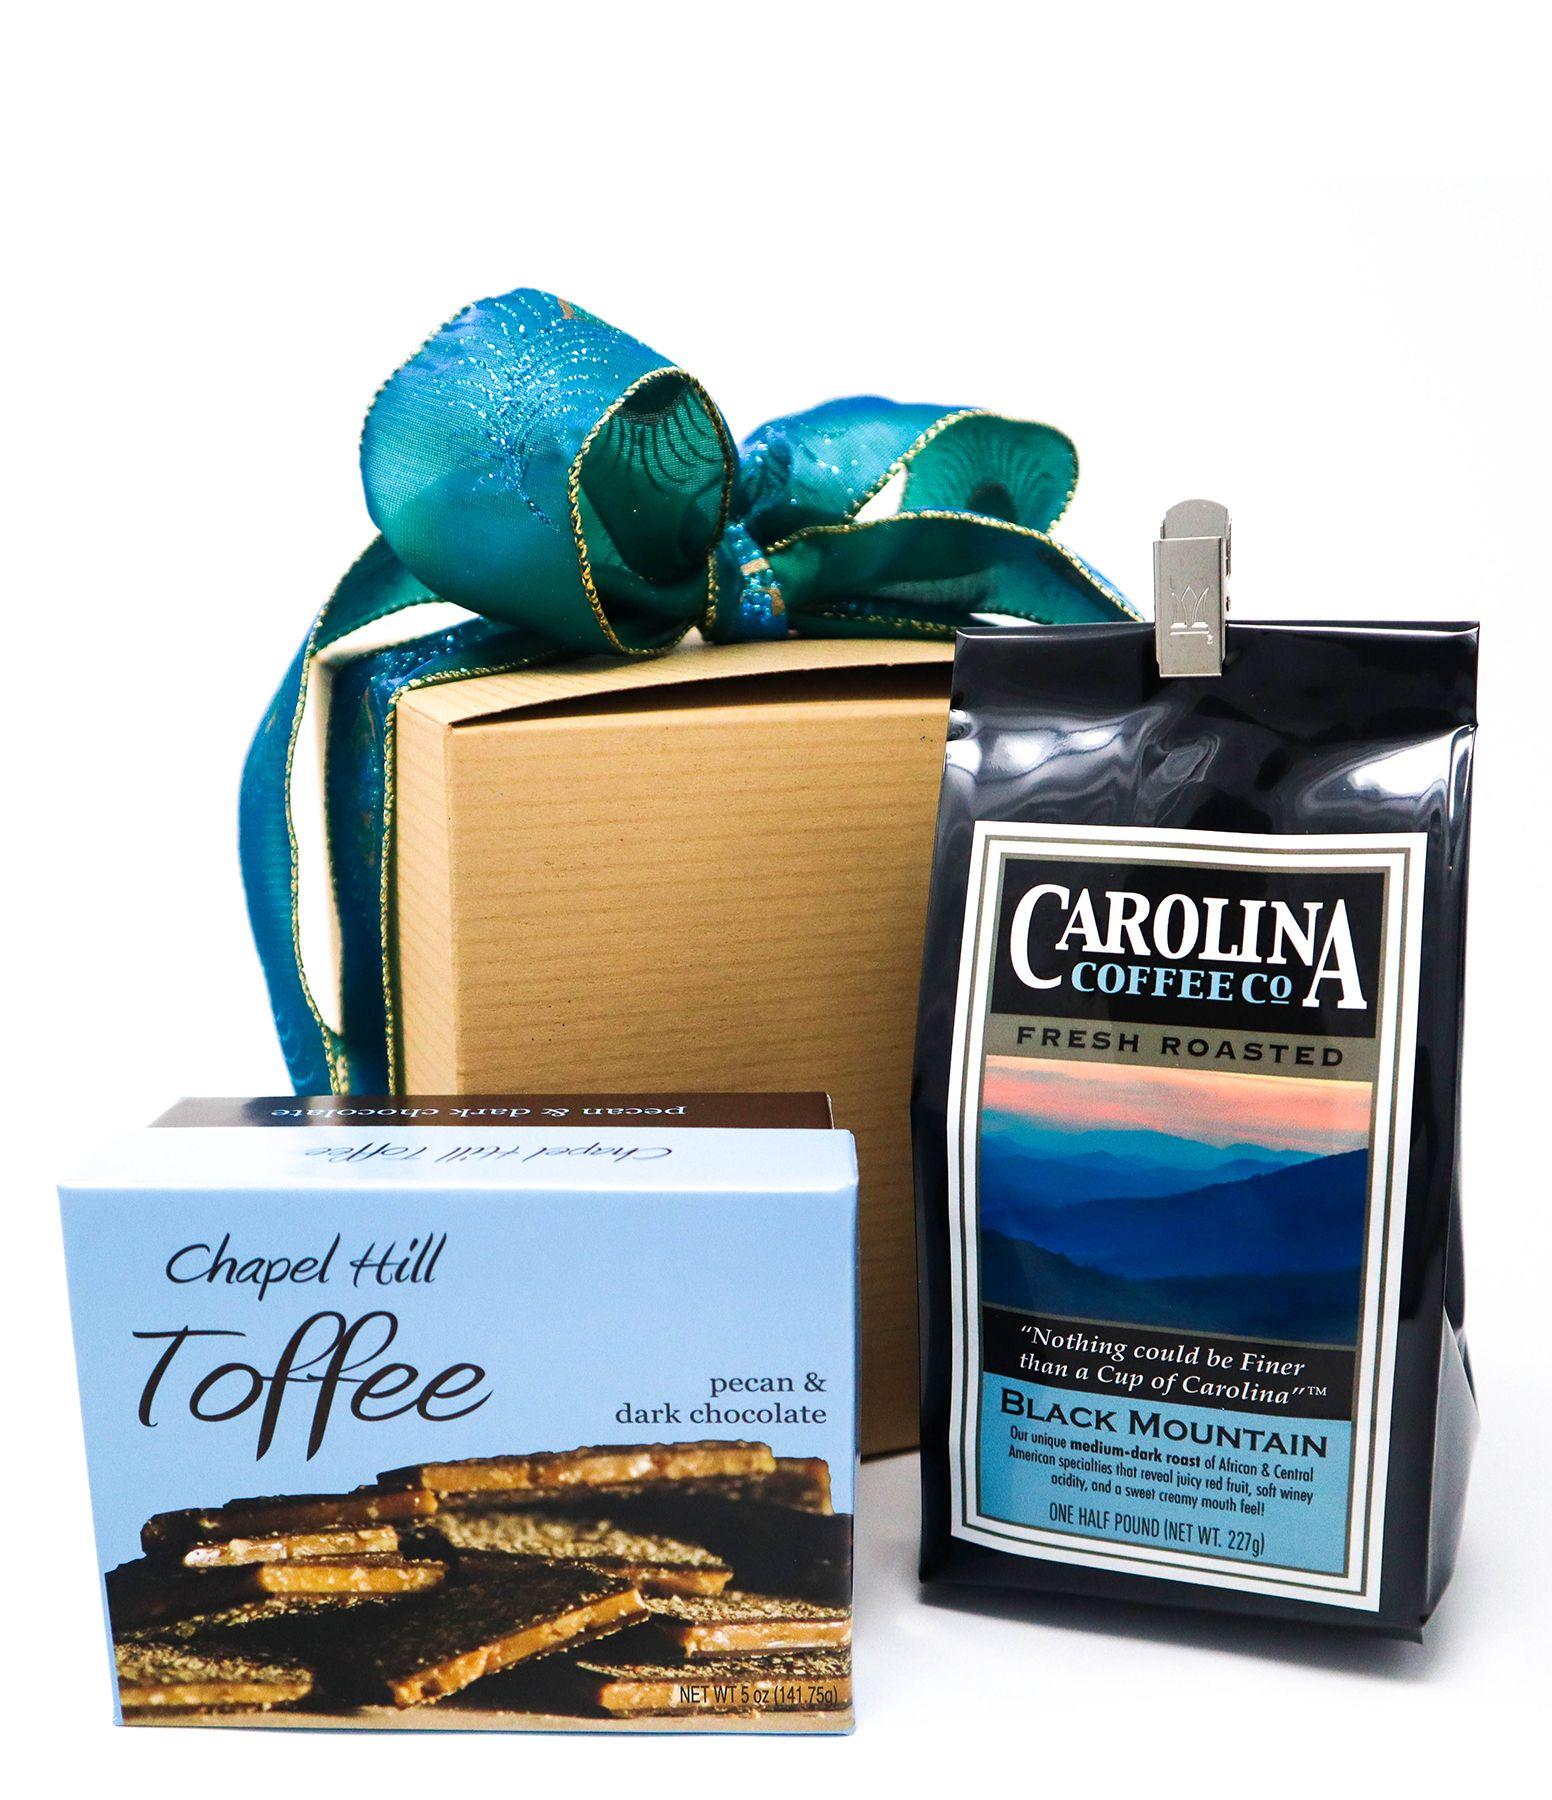 Carolina Coffee Chapel Hill Toffee and Coffee Gift Box